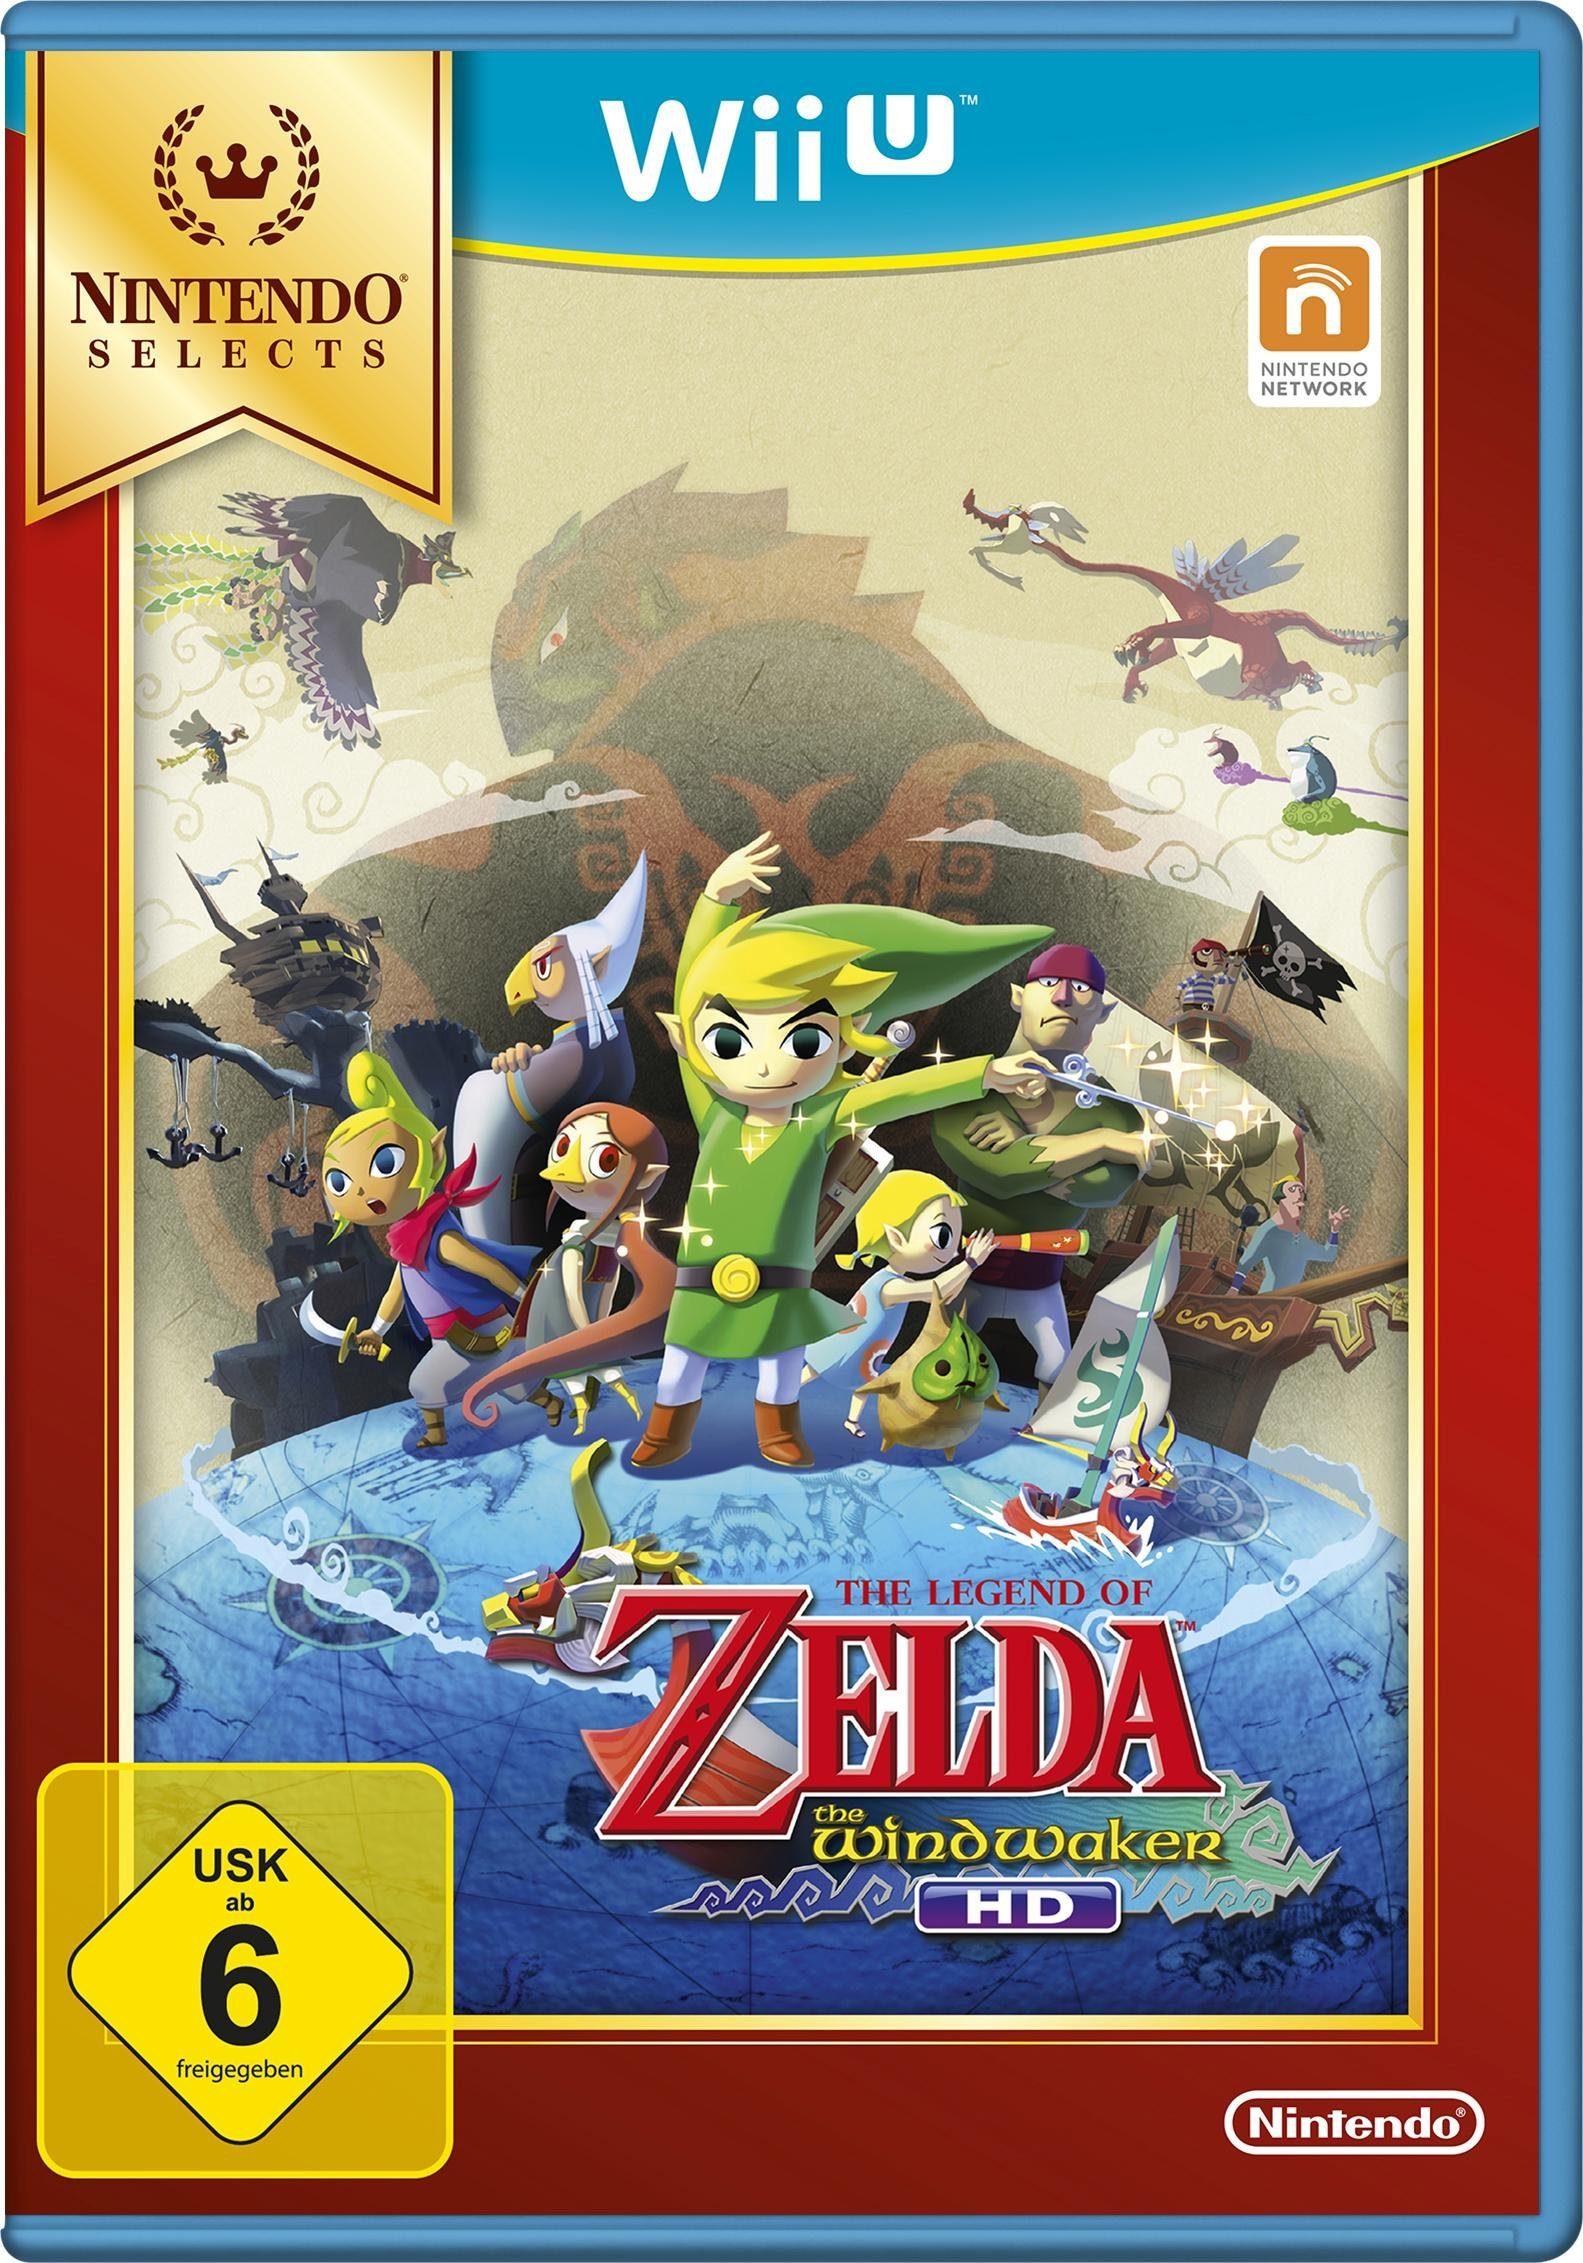 The Legend of Zelda: The Wind Waker HD Nintendo Selects Wii U